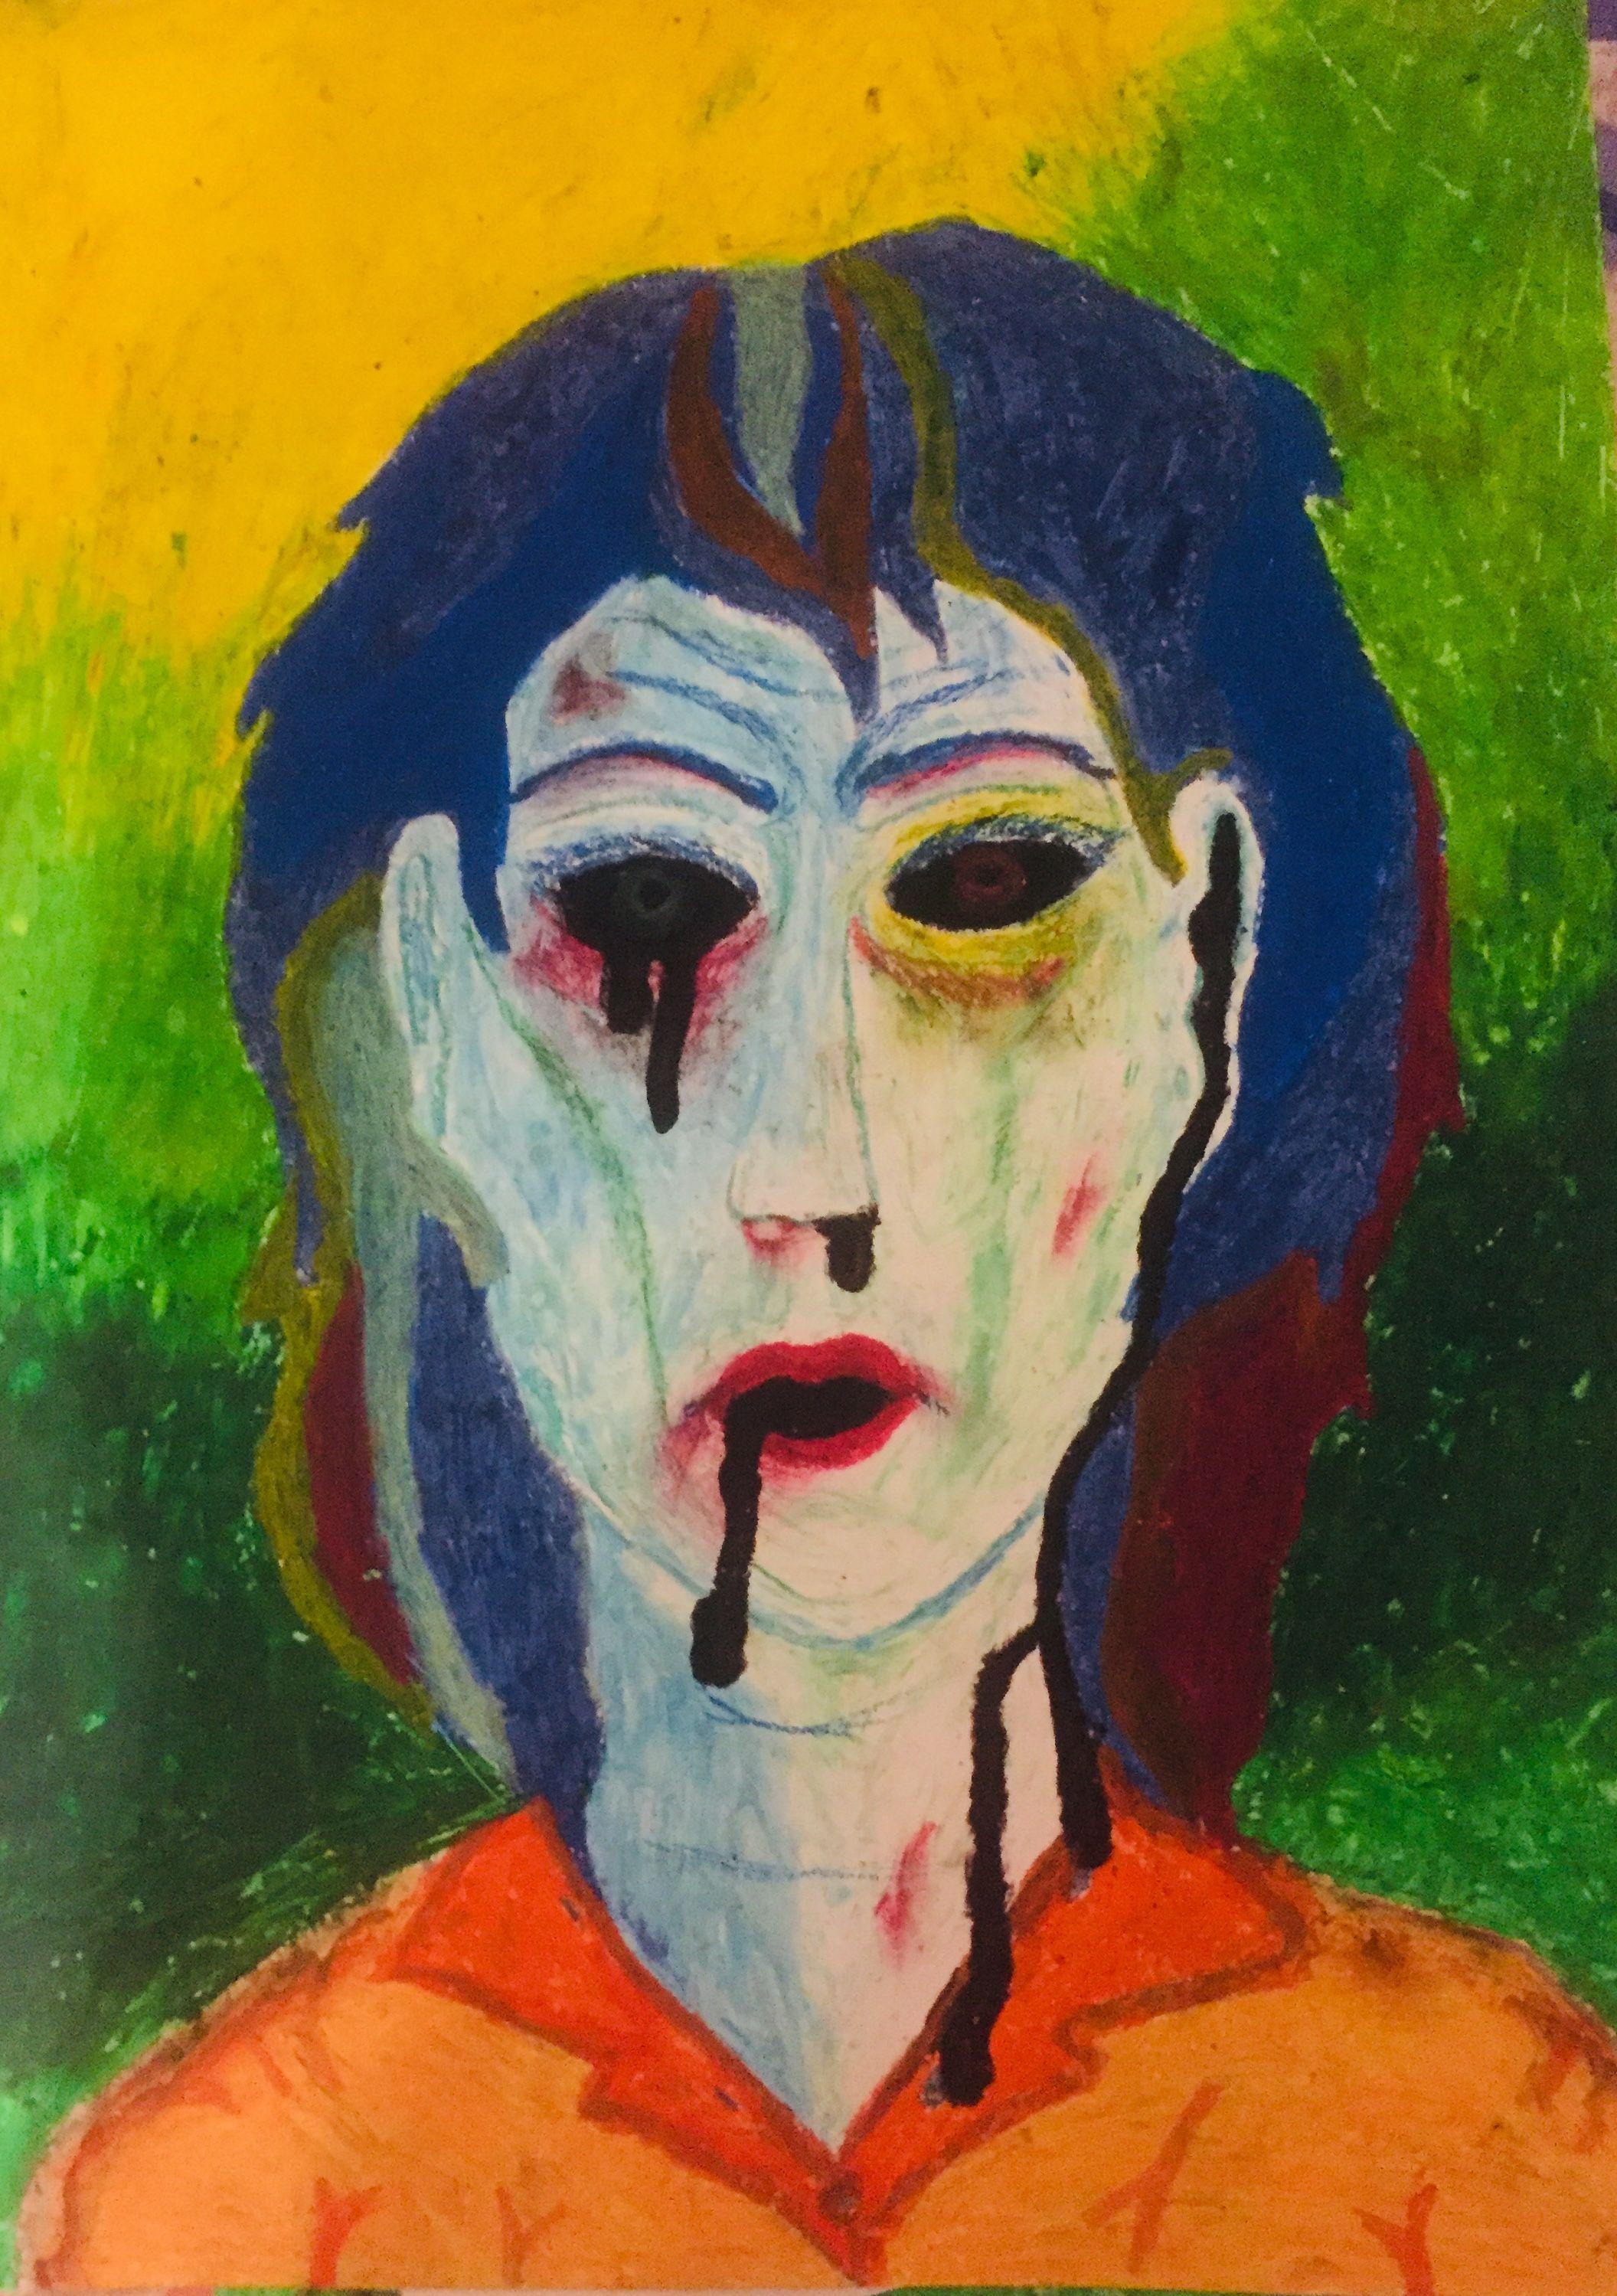 Nastia Painting | Art painting, Art, Modern art abstract